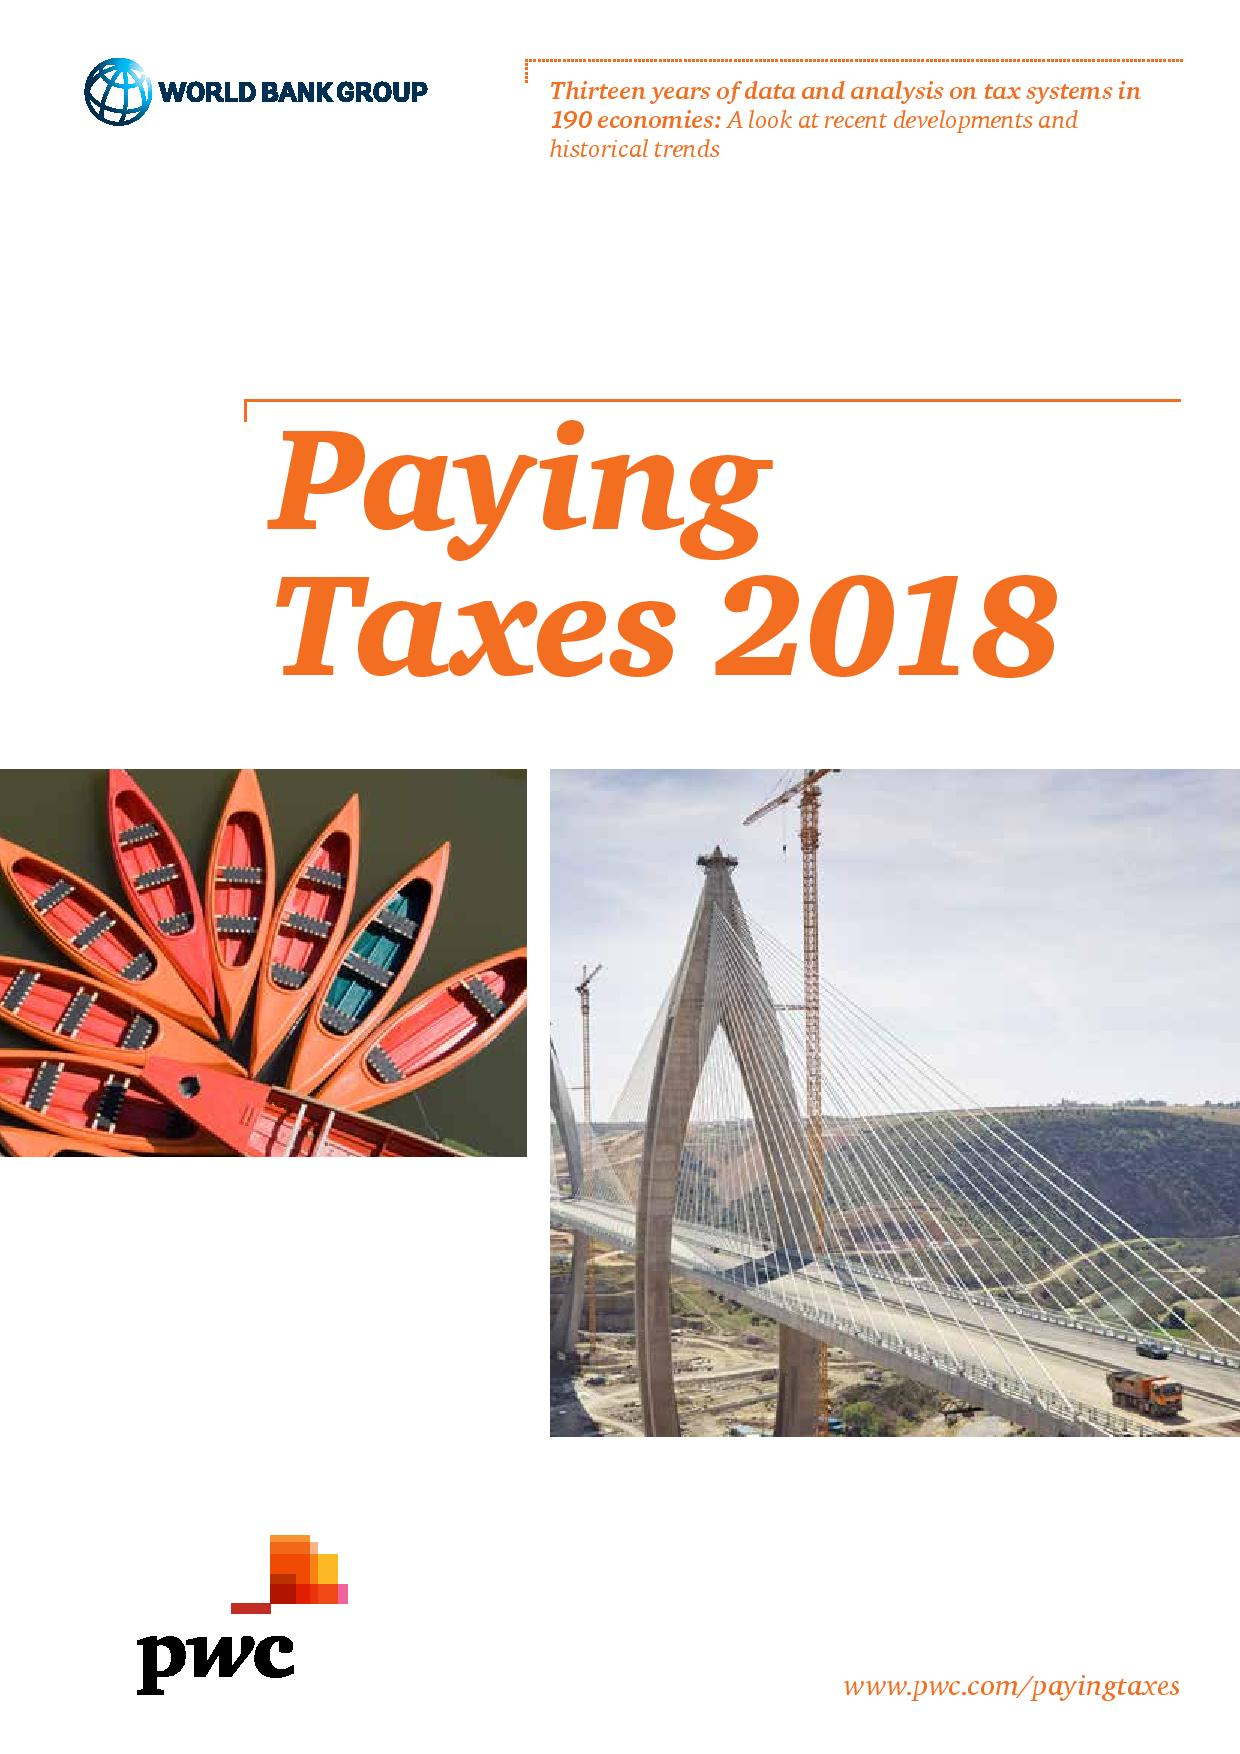 PwC: Paying Taxes 2018